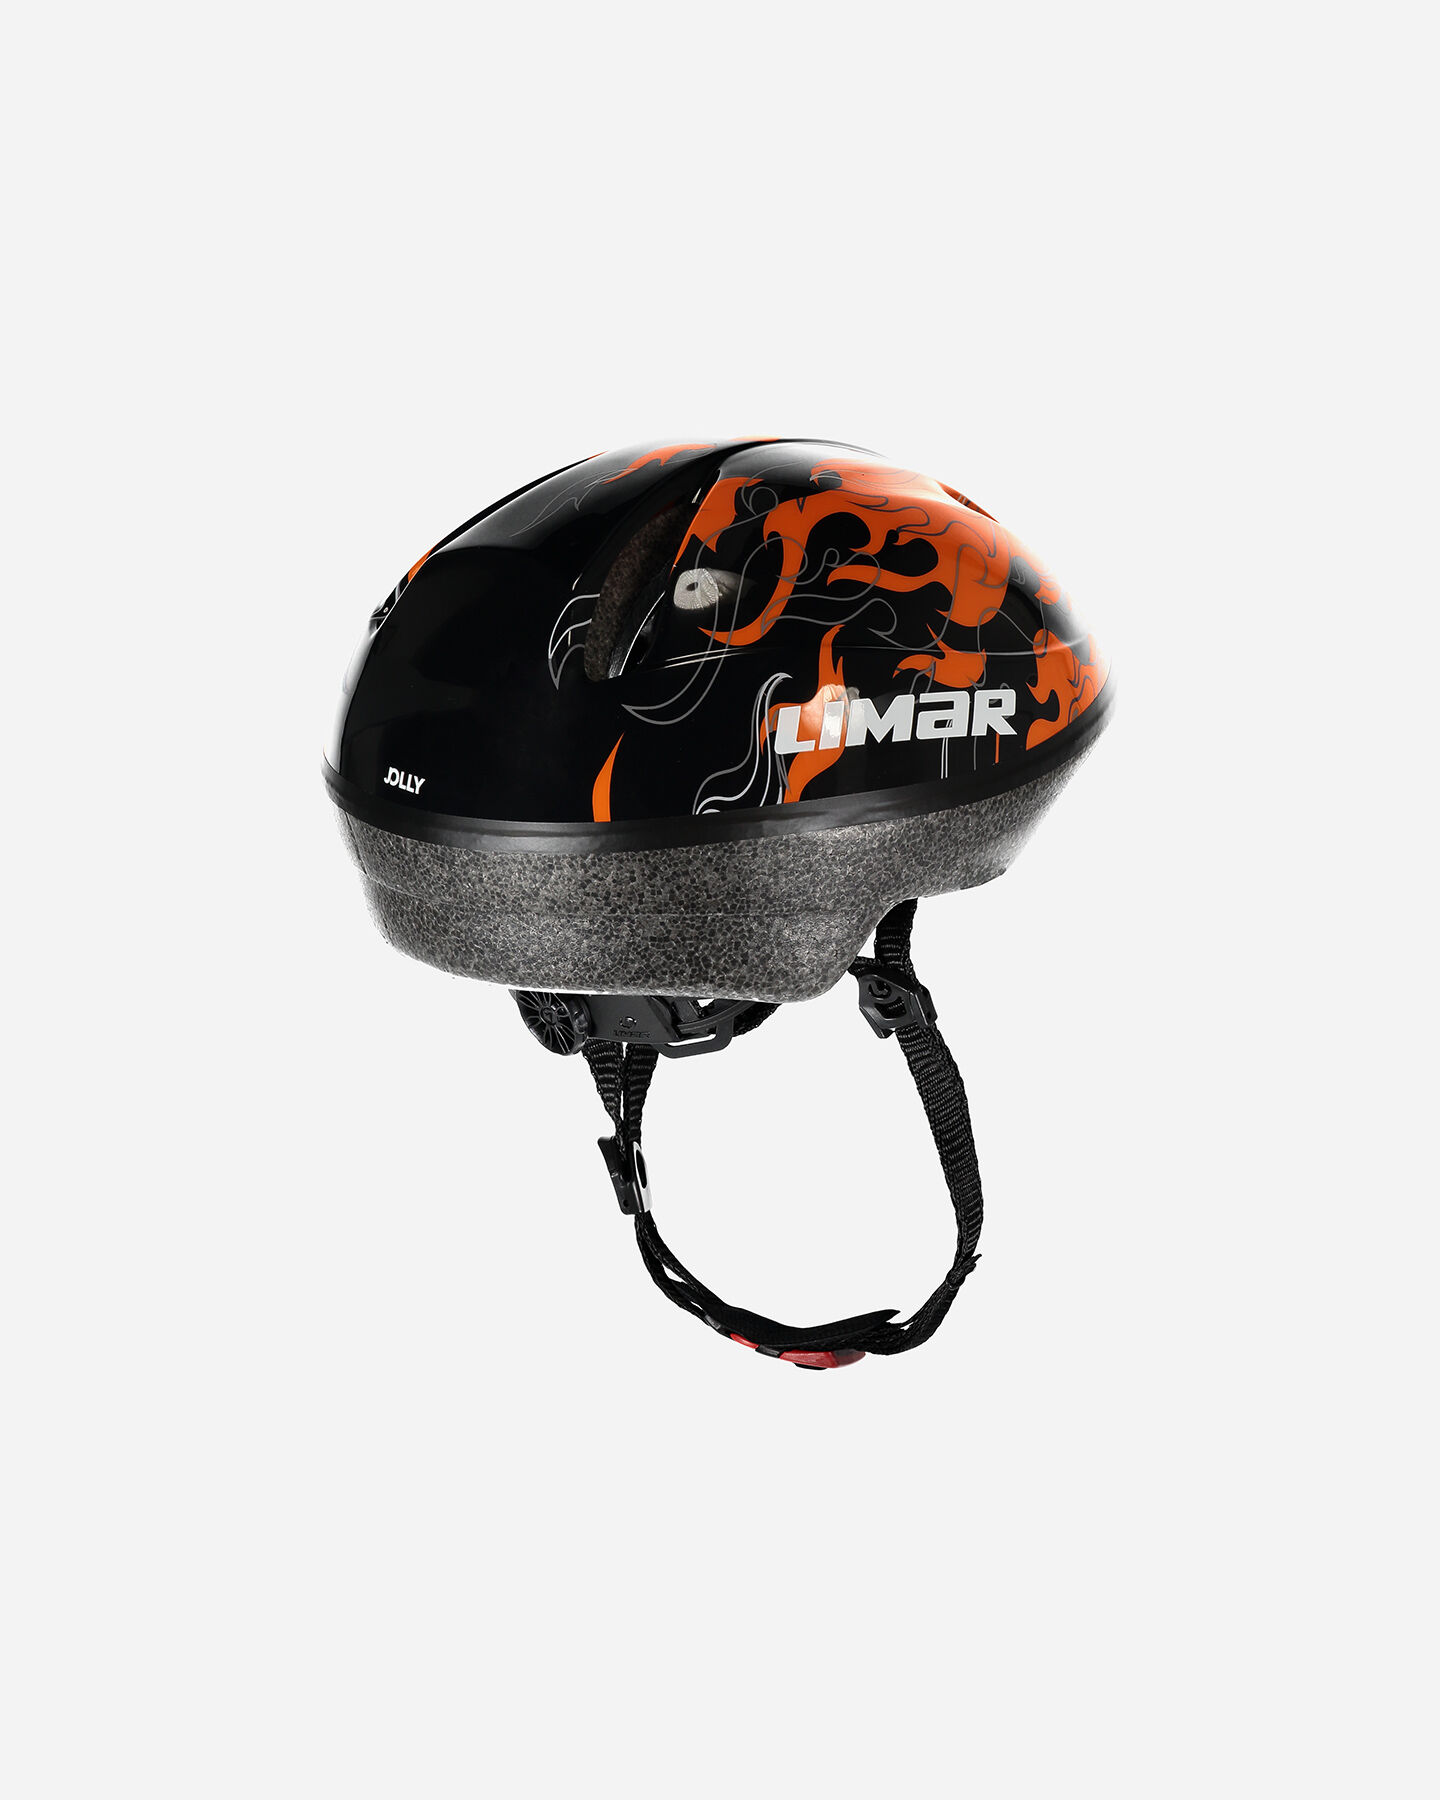 Casco bici LIMAR JOLLY JR S4064384|1|UNI scatto 1